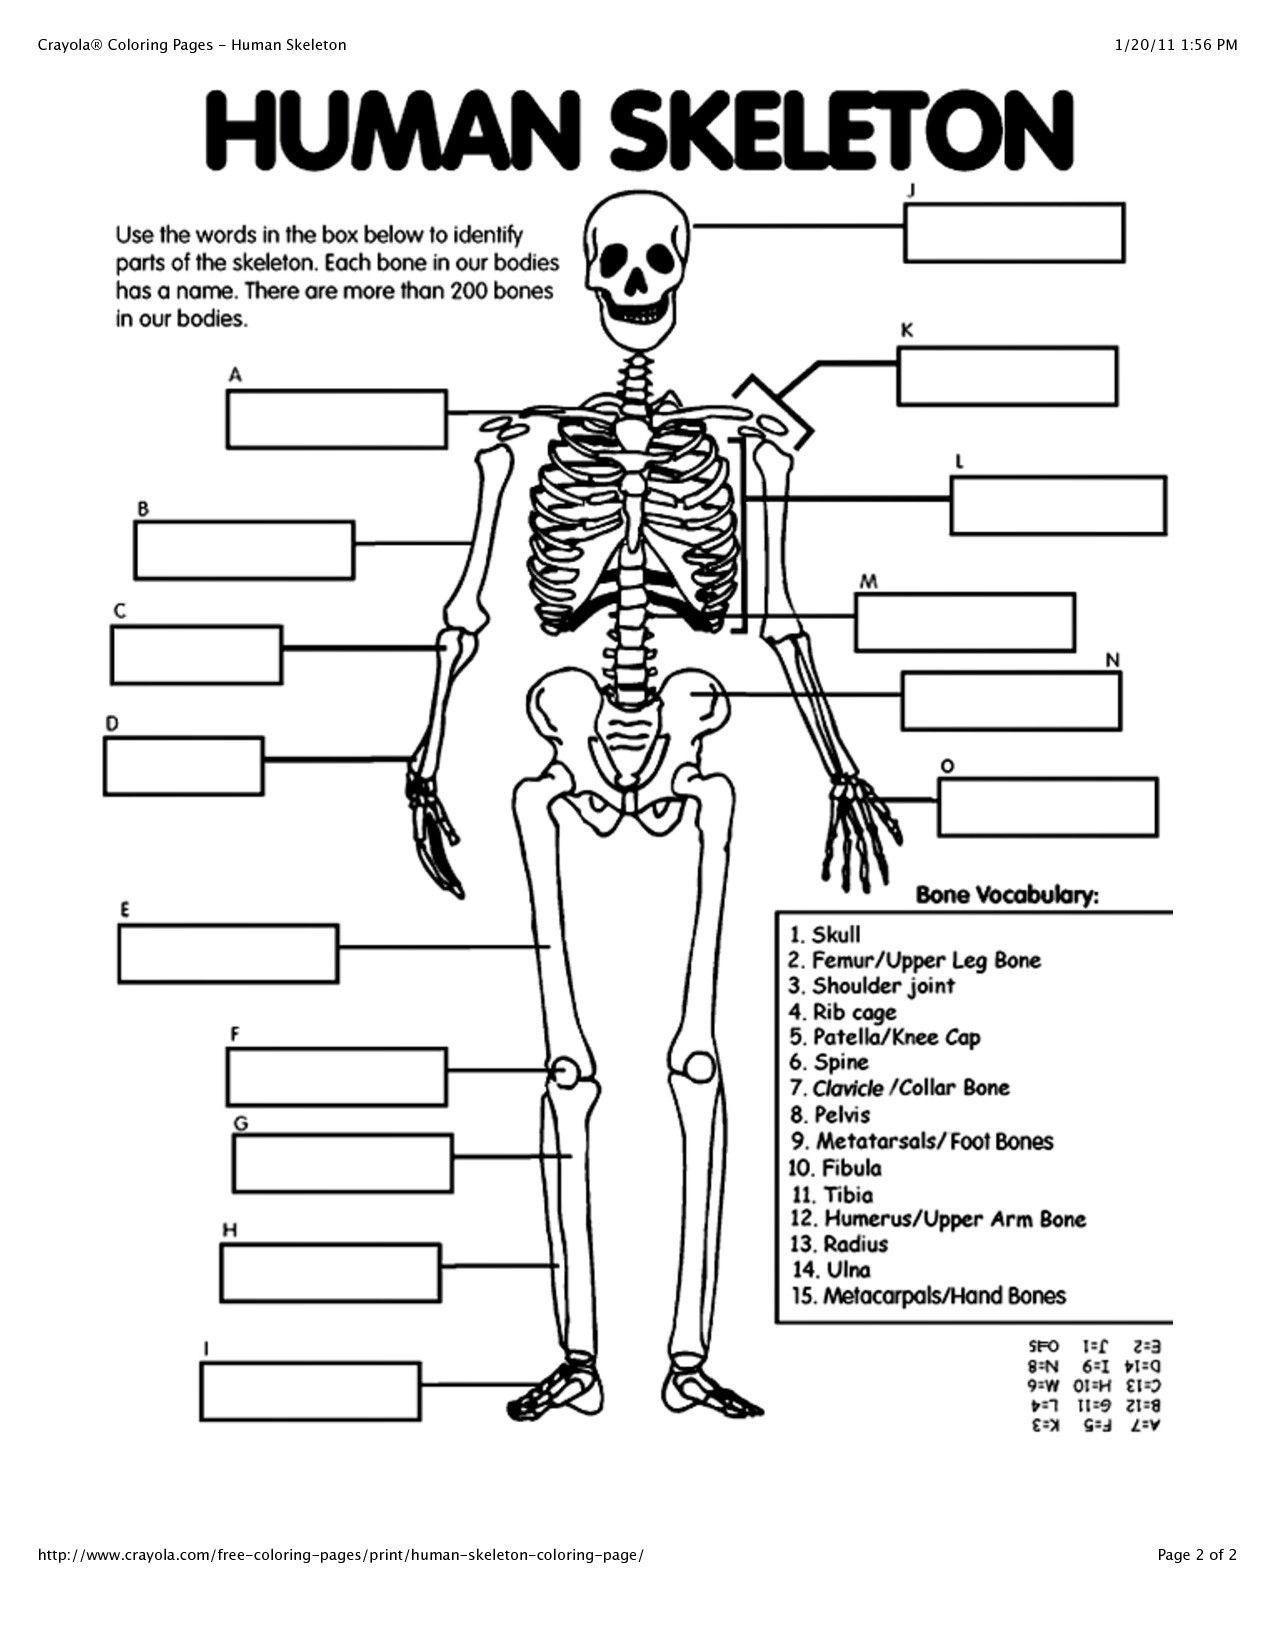 The Skeletal System Worksheet Human Anatomy for Beginners